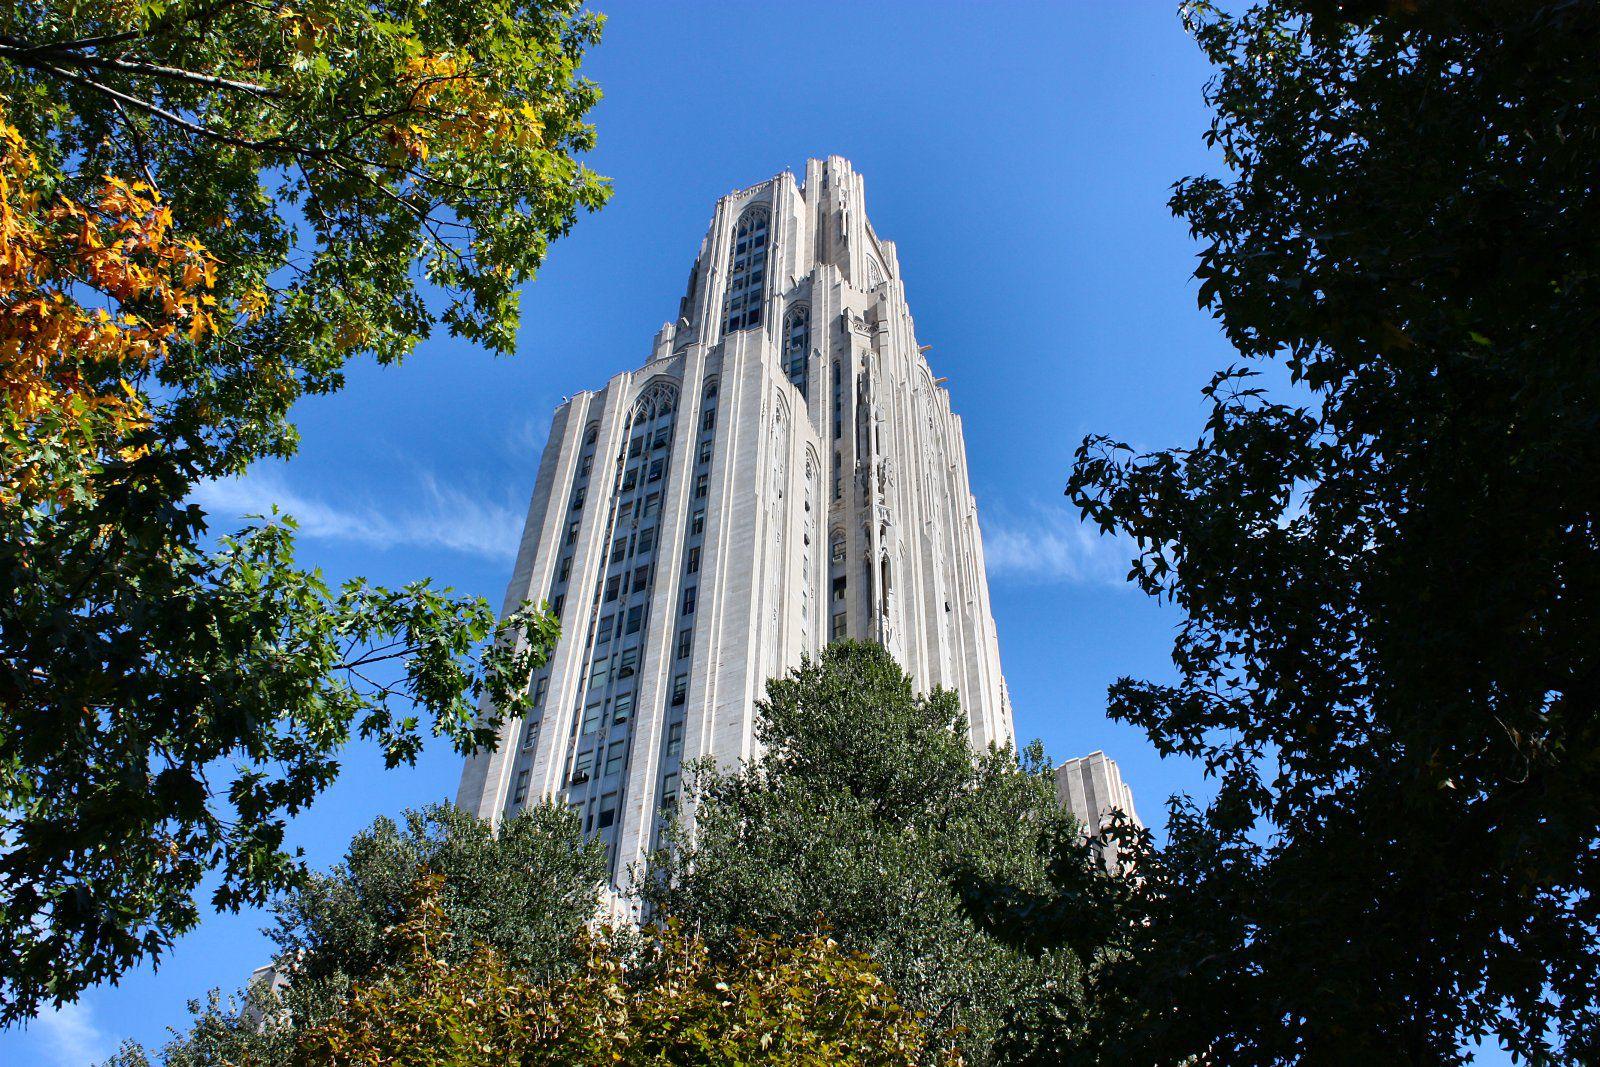 Pitt admissions essay